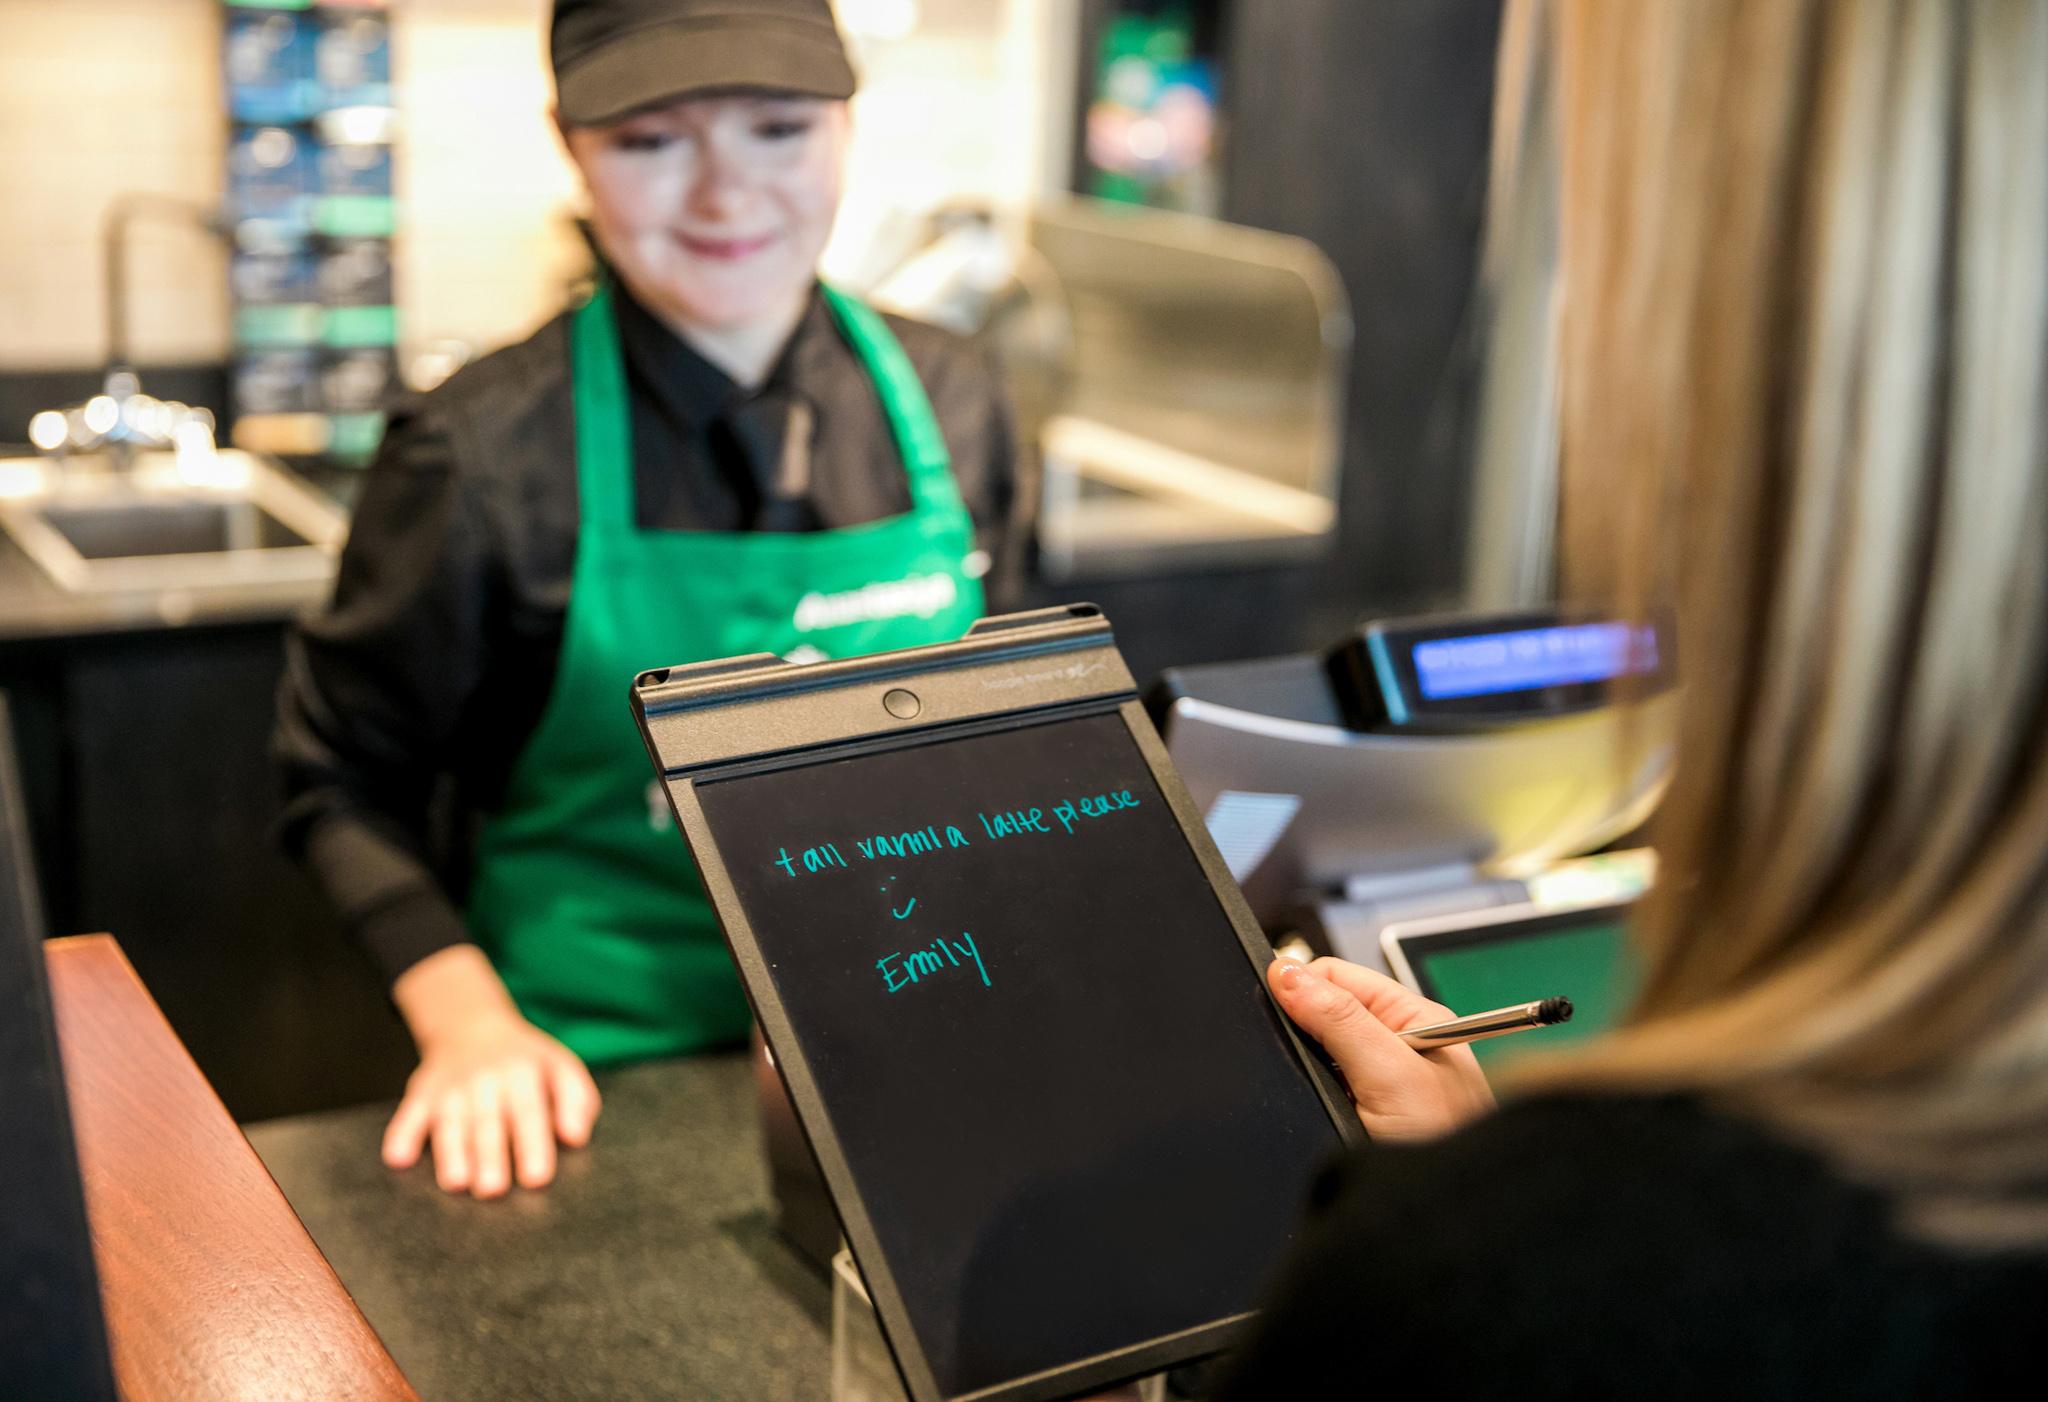 Customer writing drink order on electronic pad in shop (© Joshua Trujillo/Starbucks)